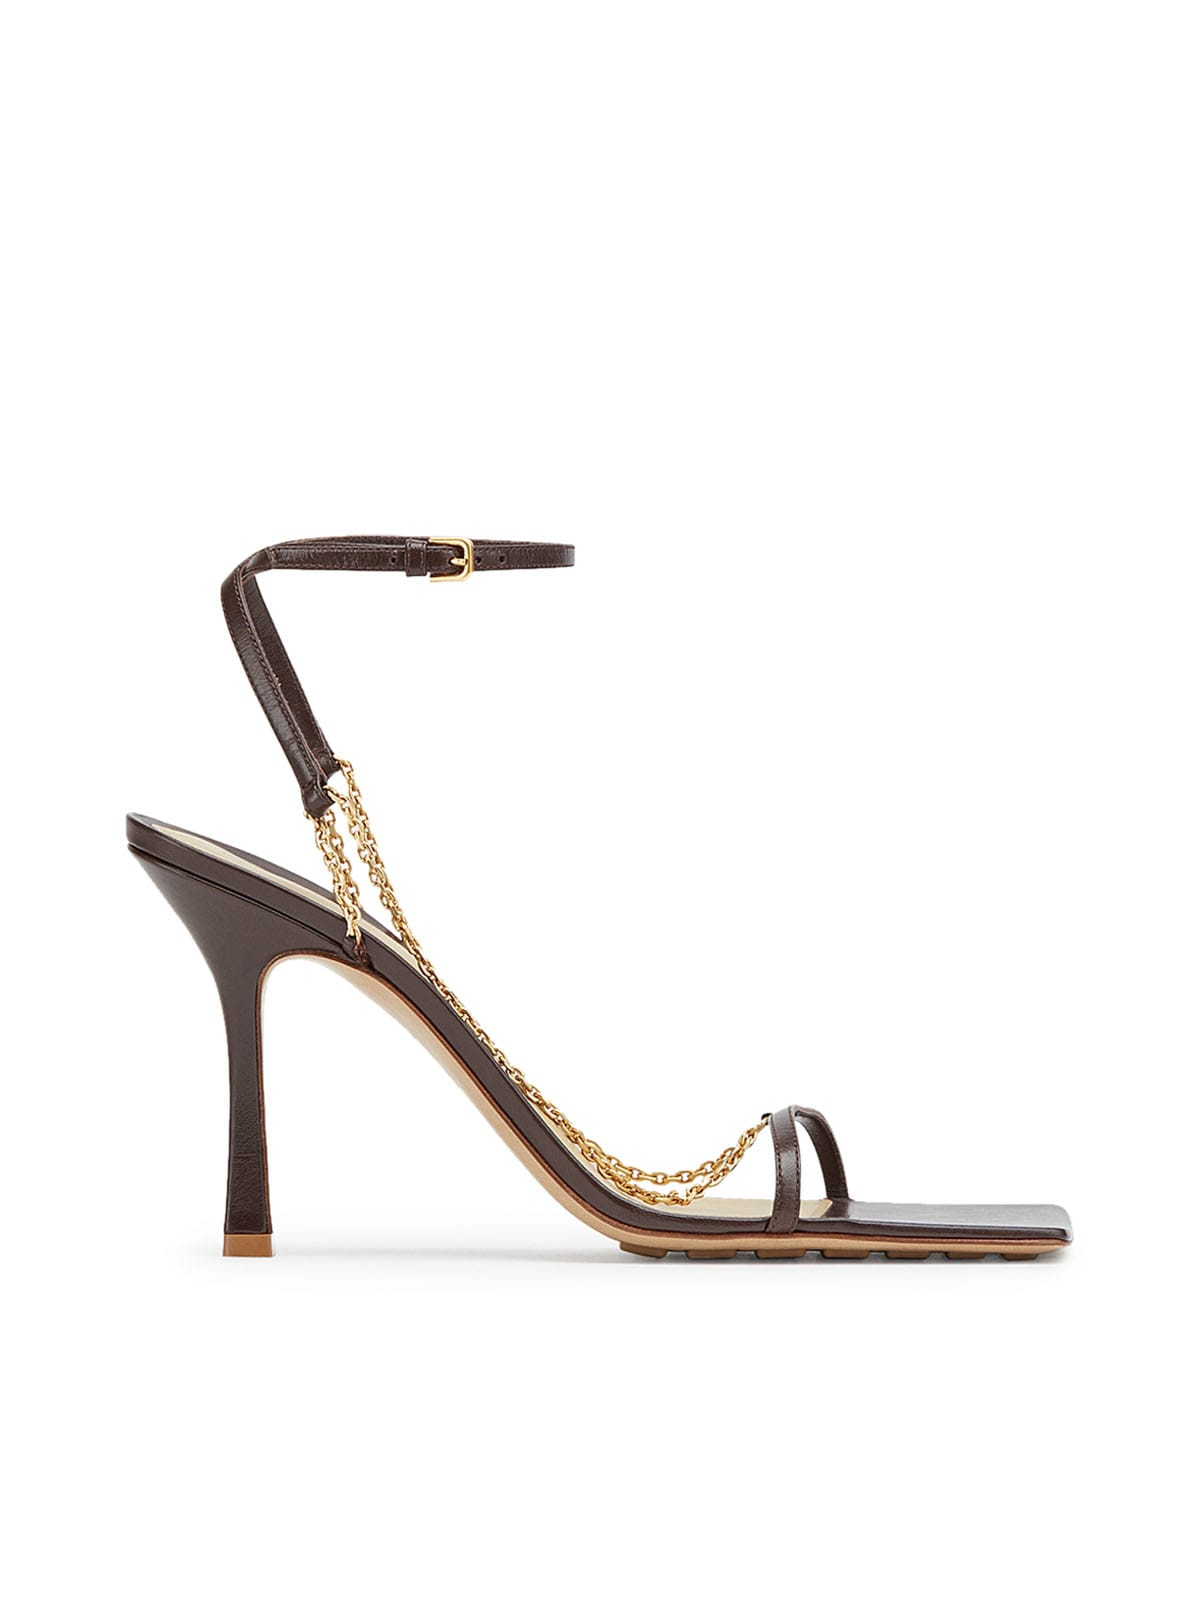 Buy Bottega Veneta Sandal Lounge Nappa online, shop Bottega Veneta shoes with free shipping